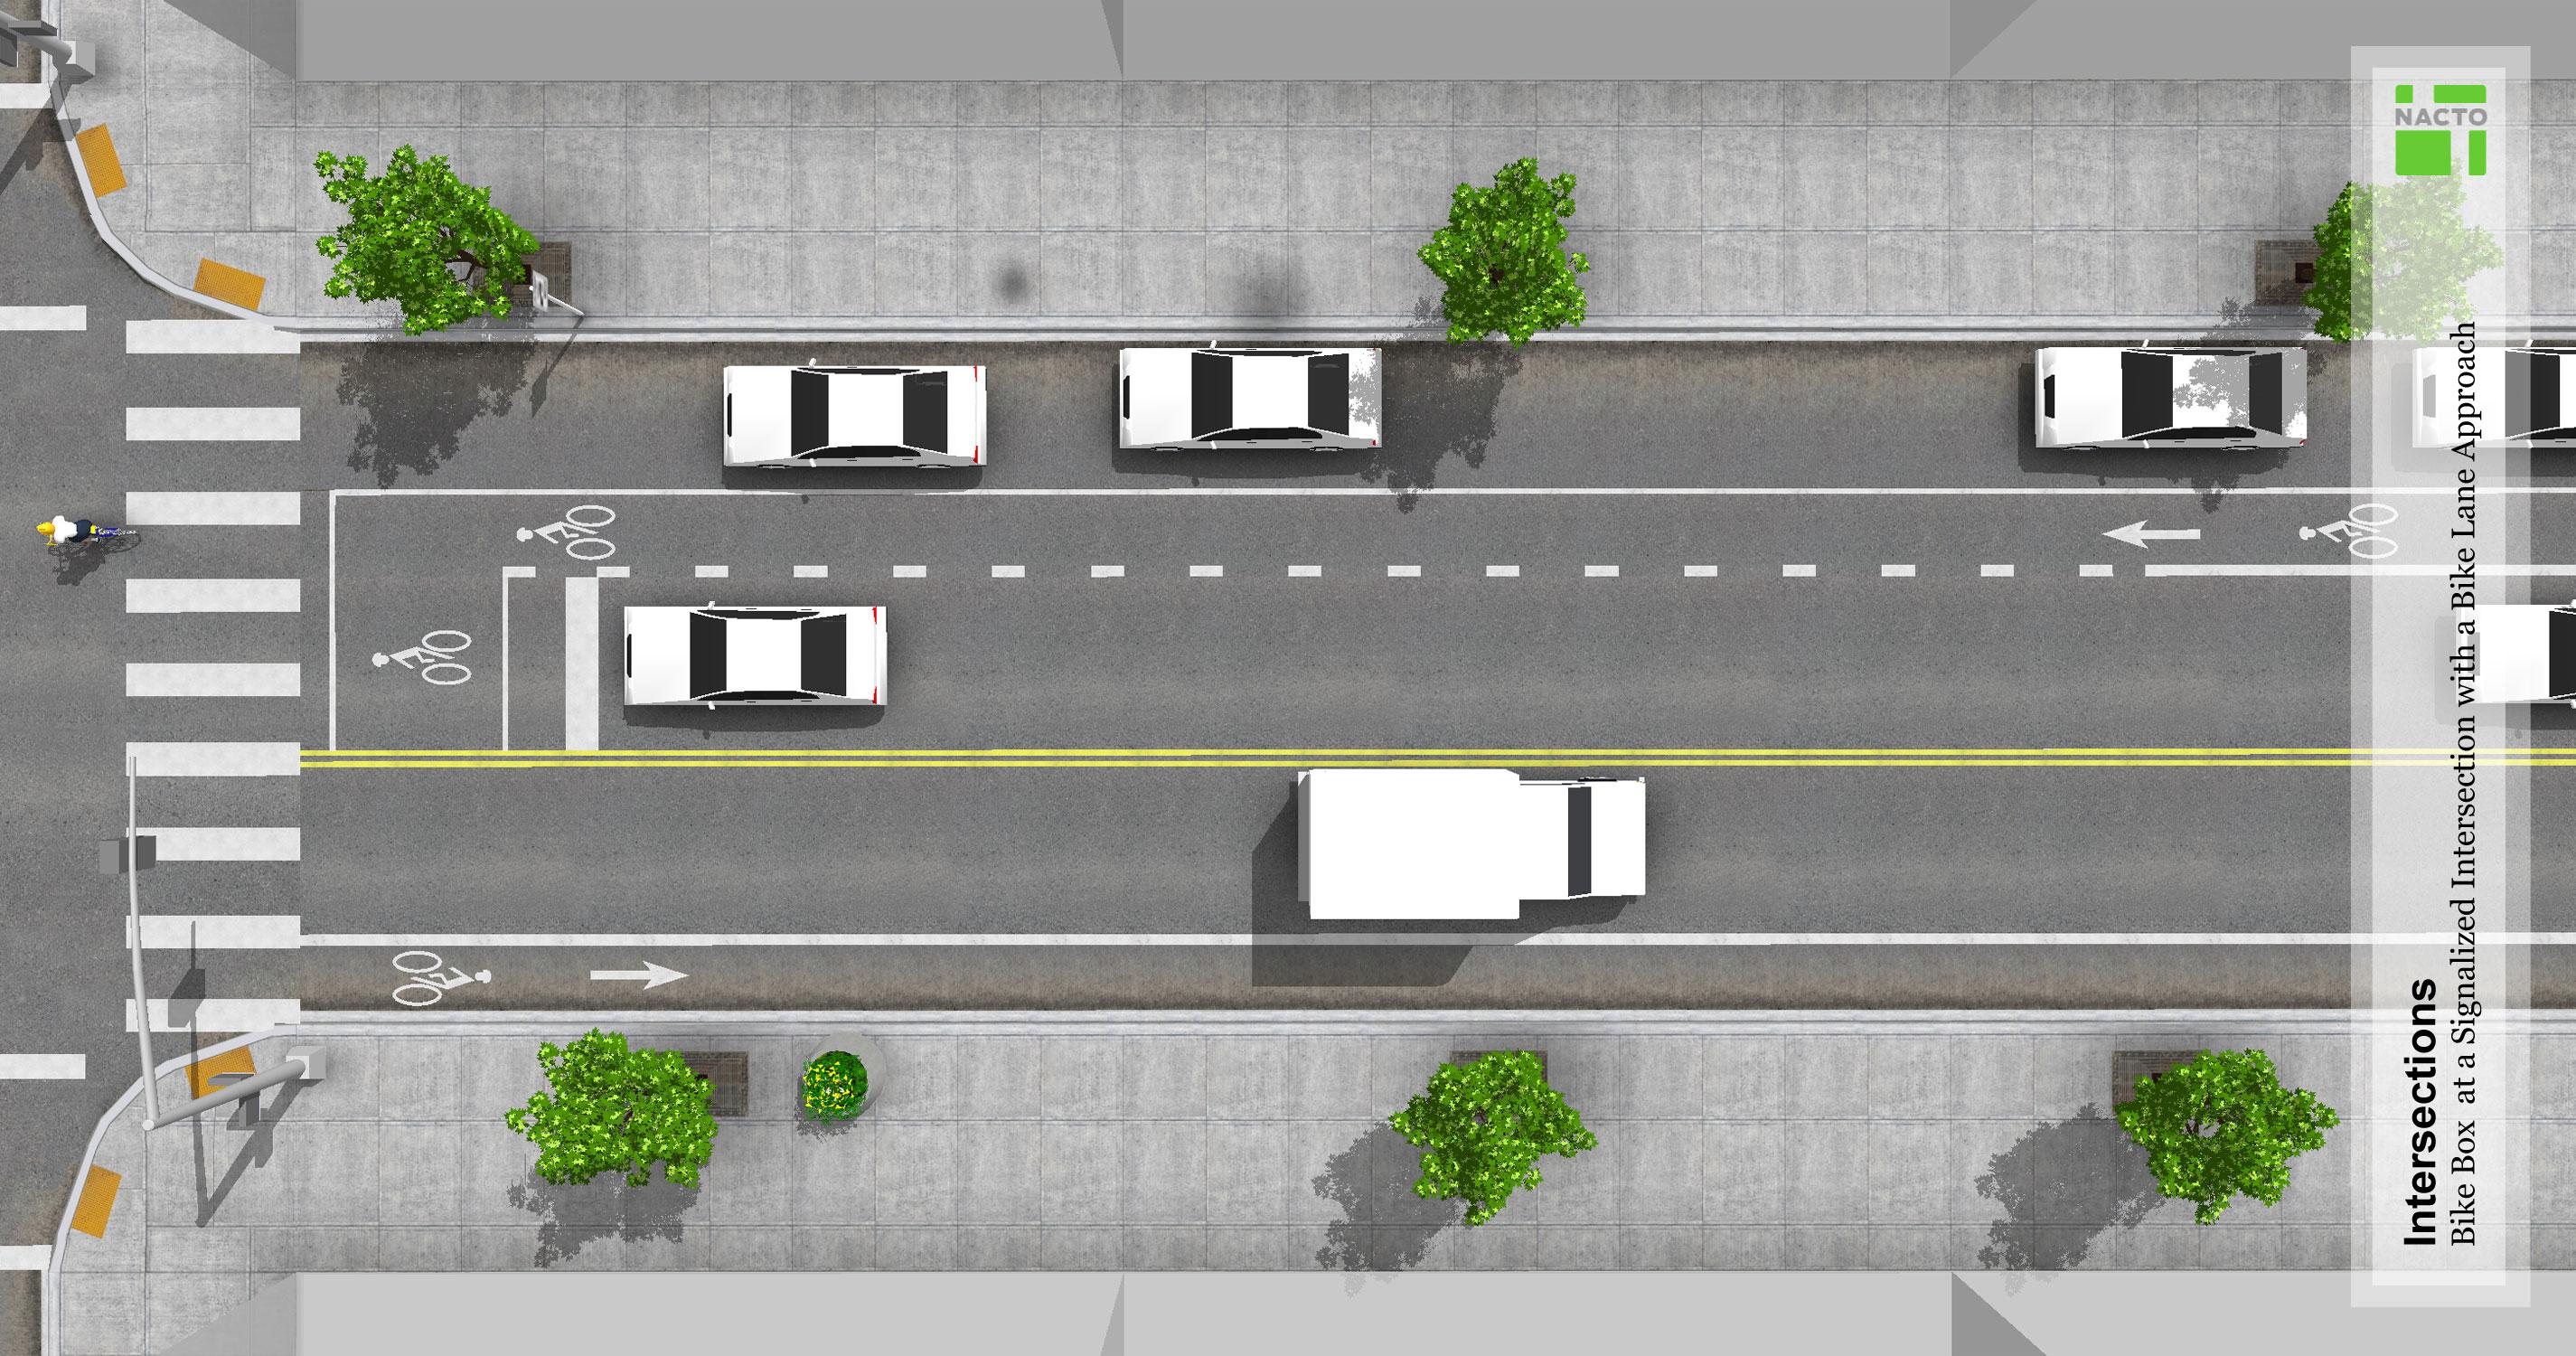 National Association Of City Transportation